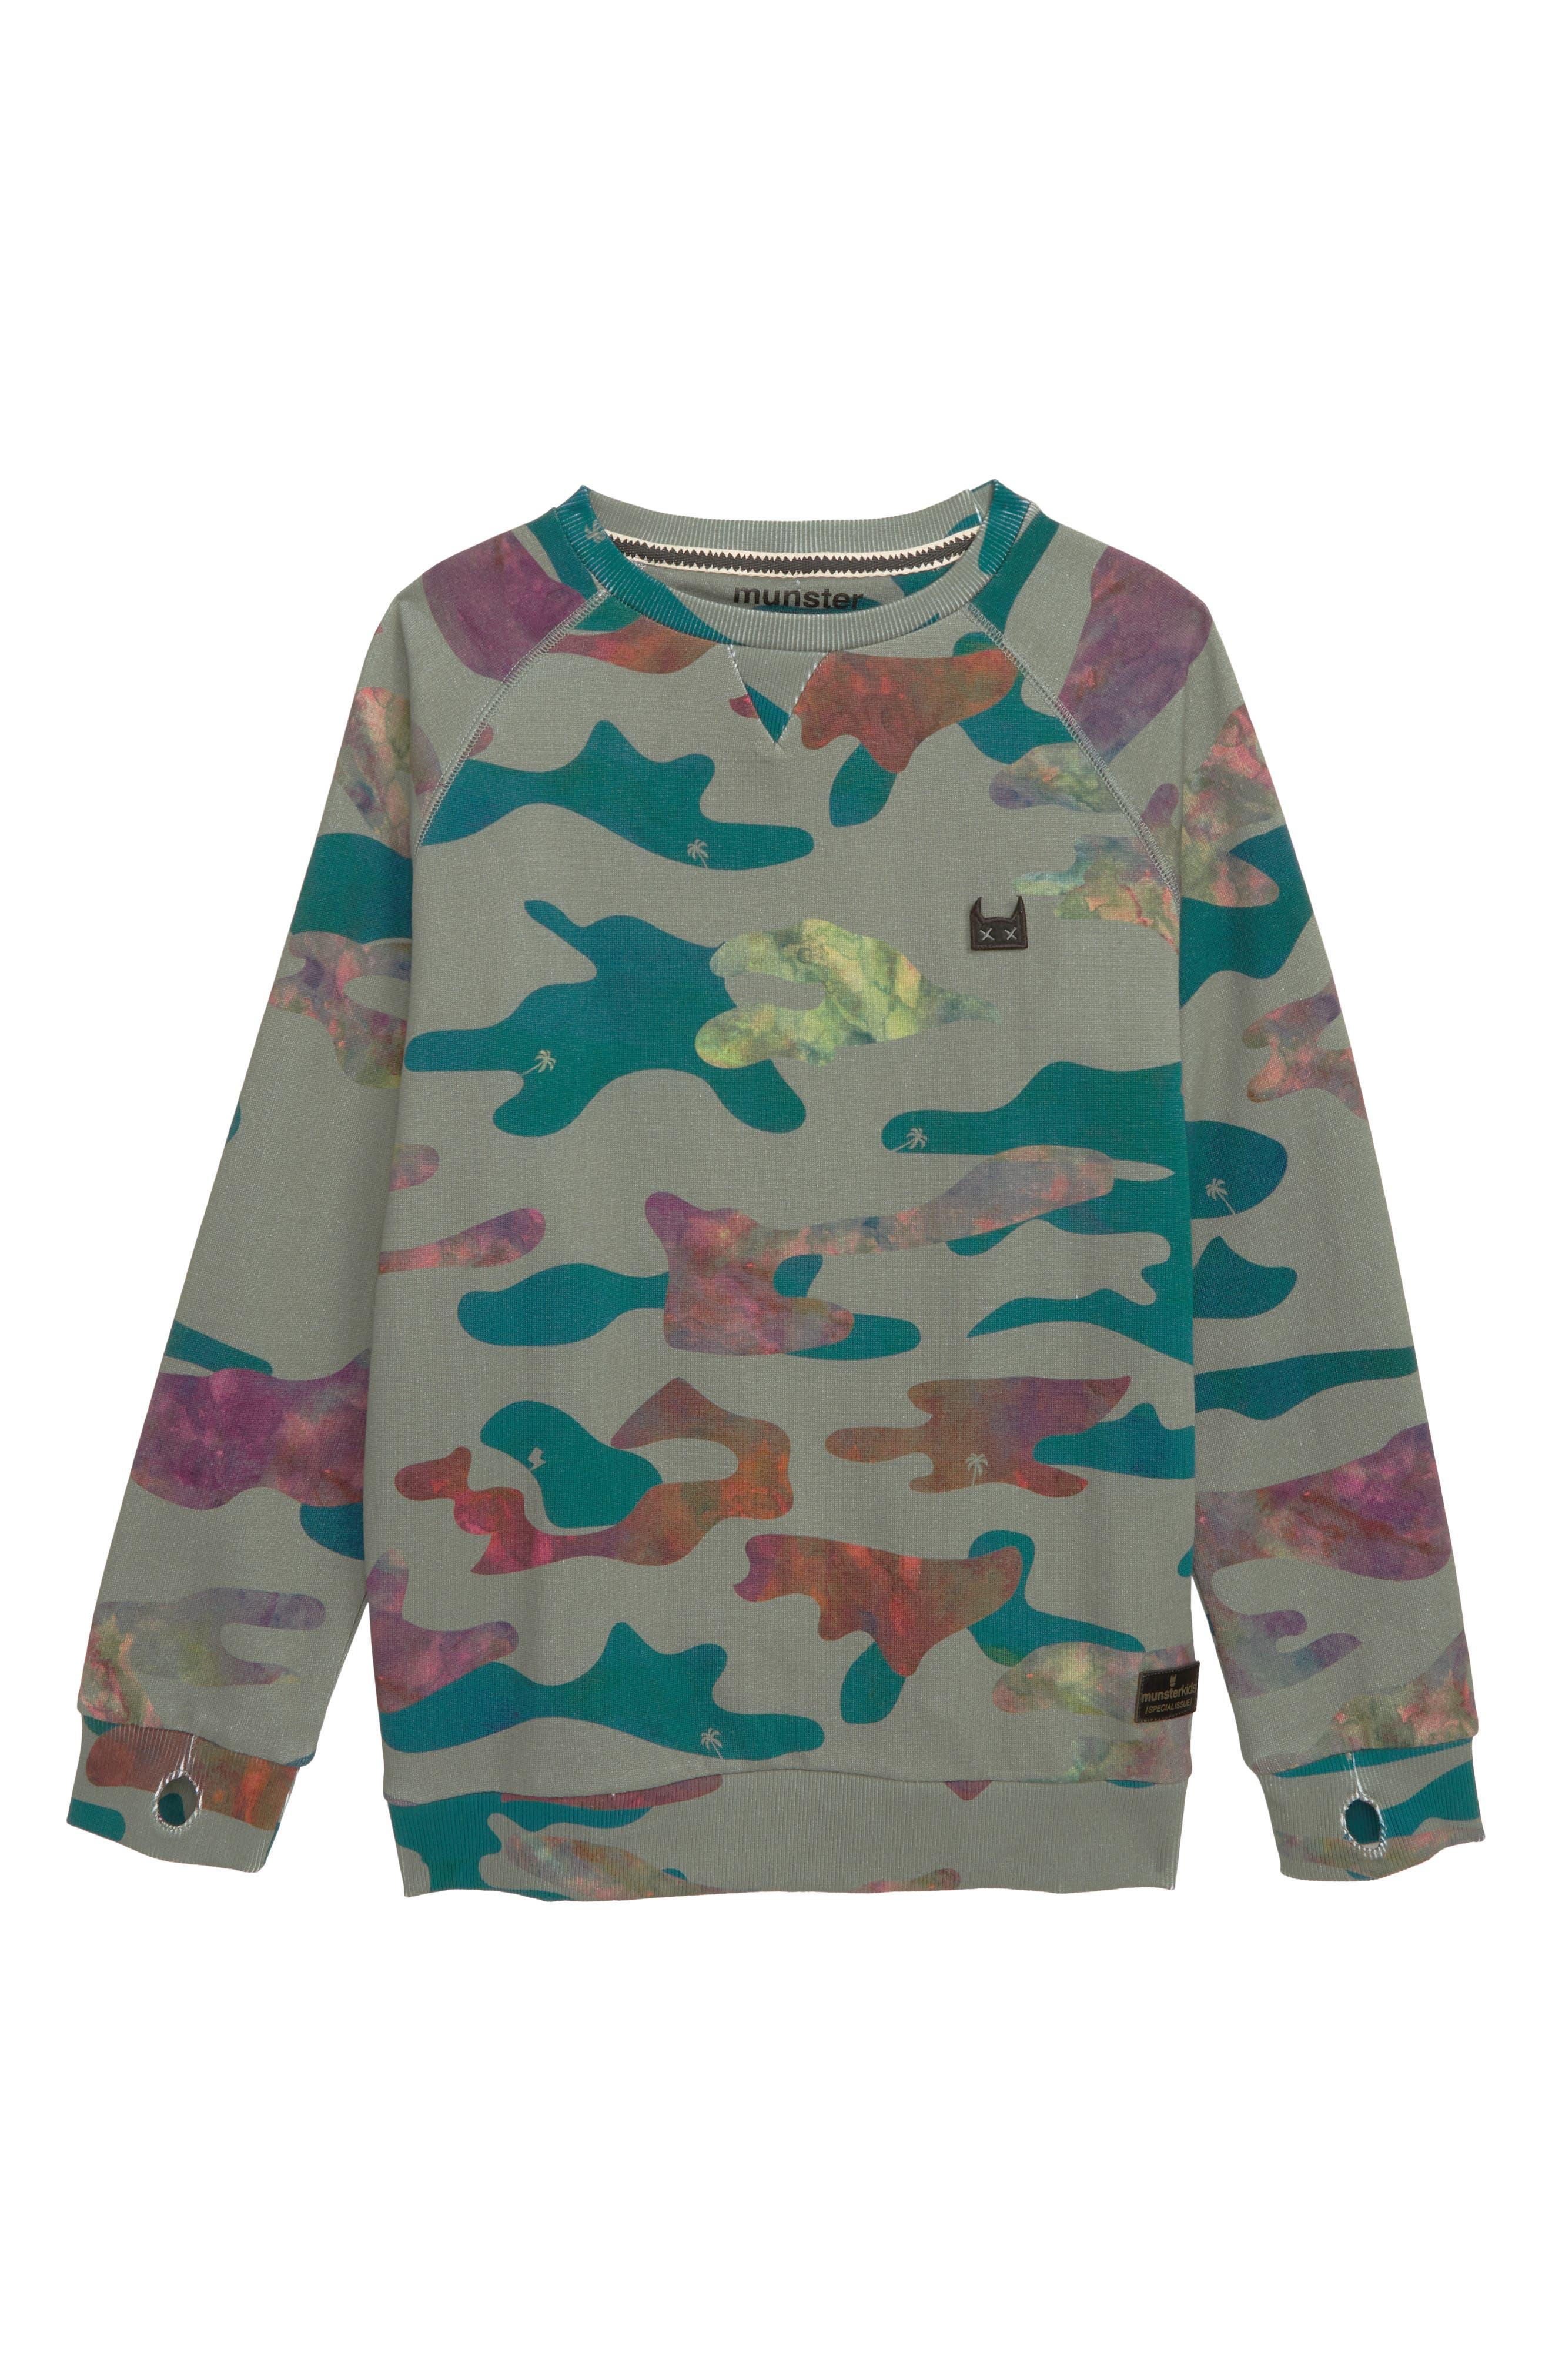 MUNSTERKIDS, Liquid Camo Sweatshirt, Main thumbnail 1, color, CAMO